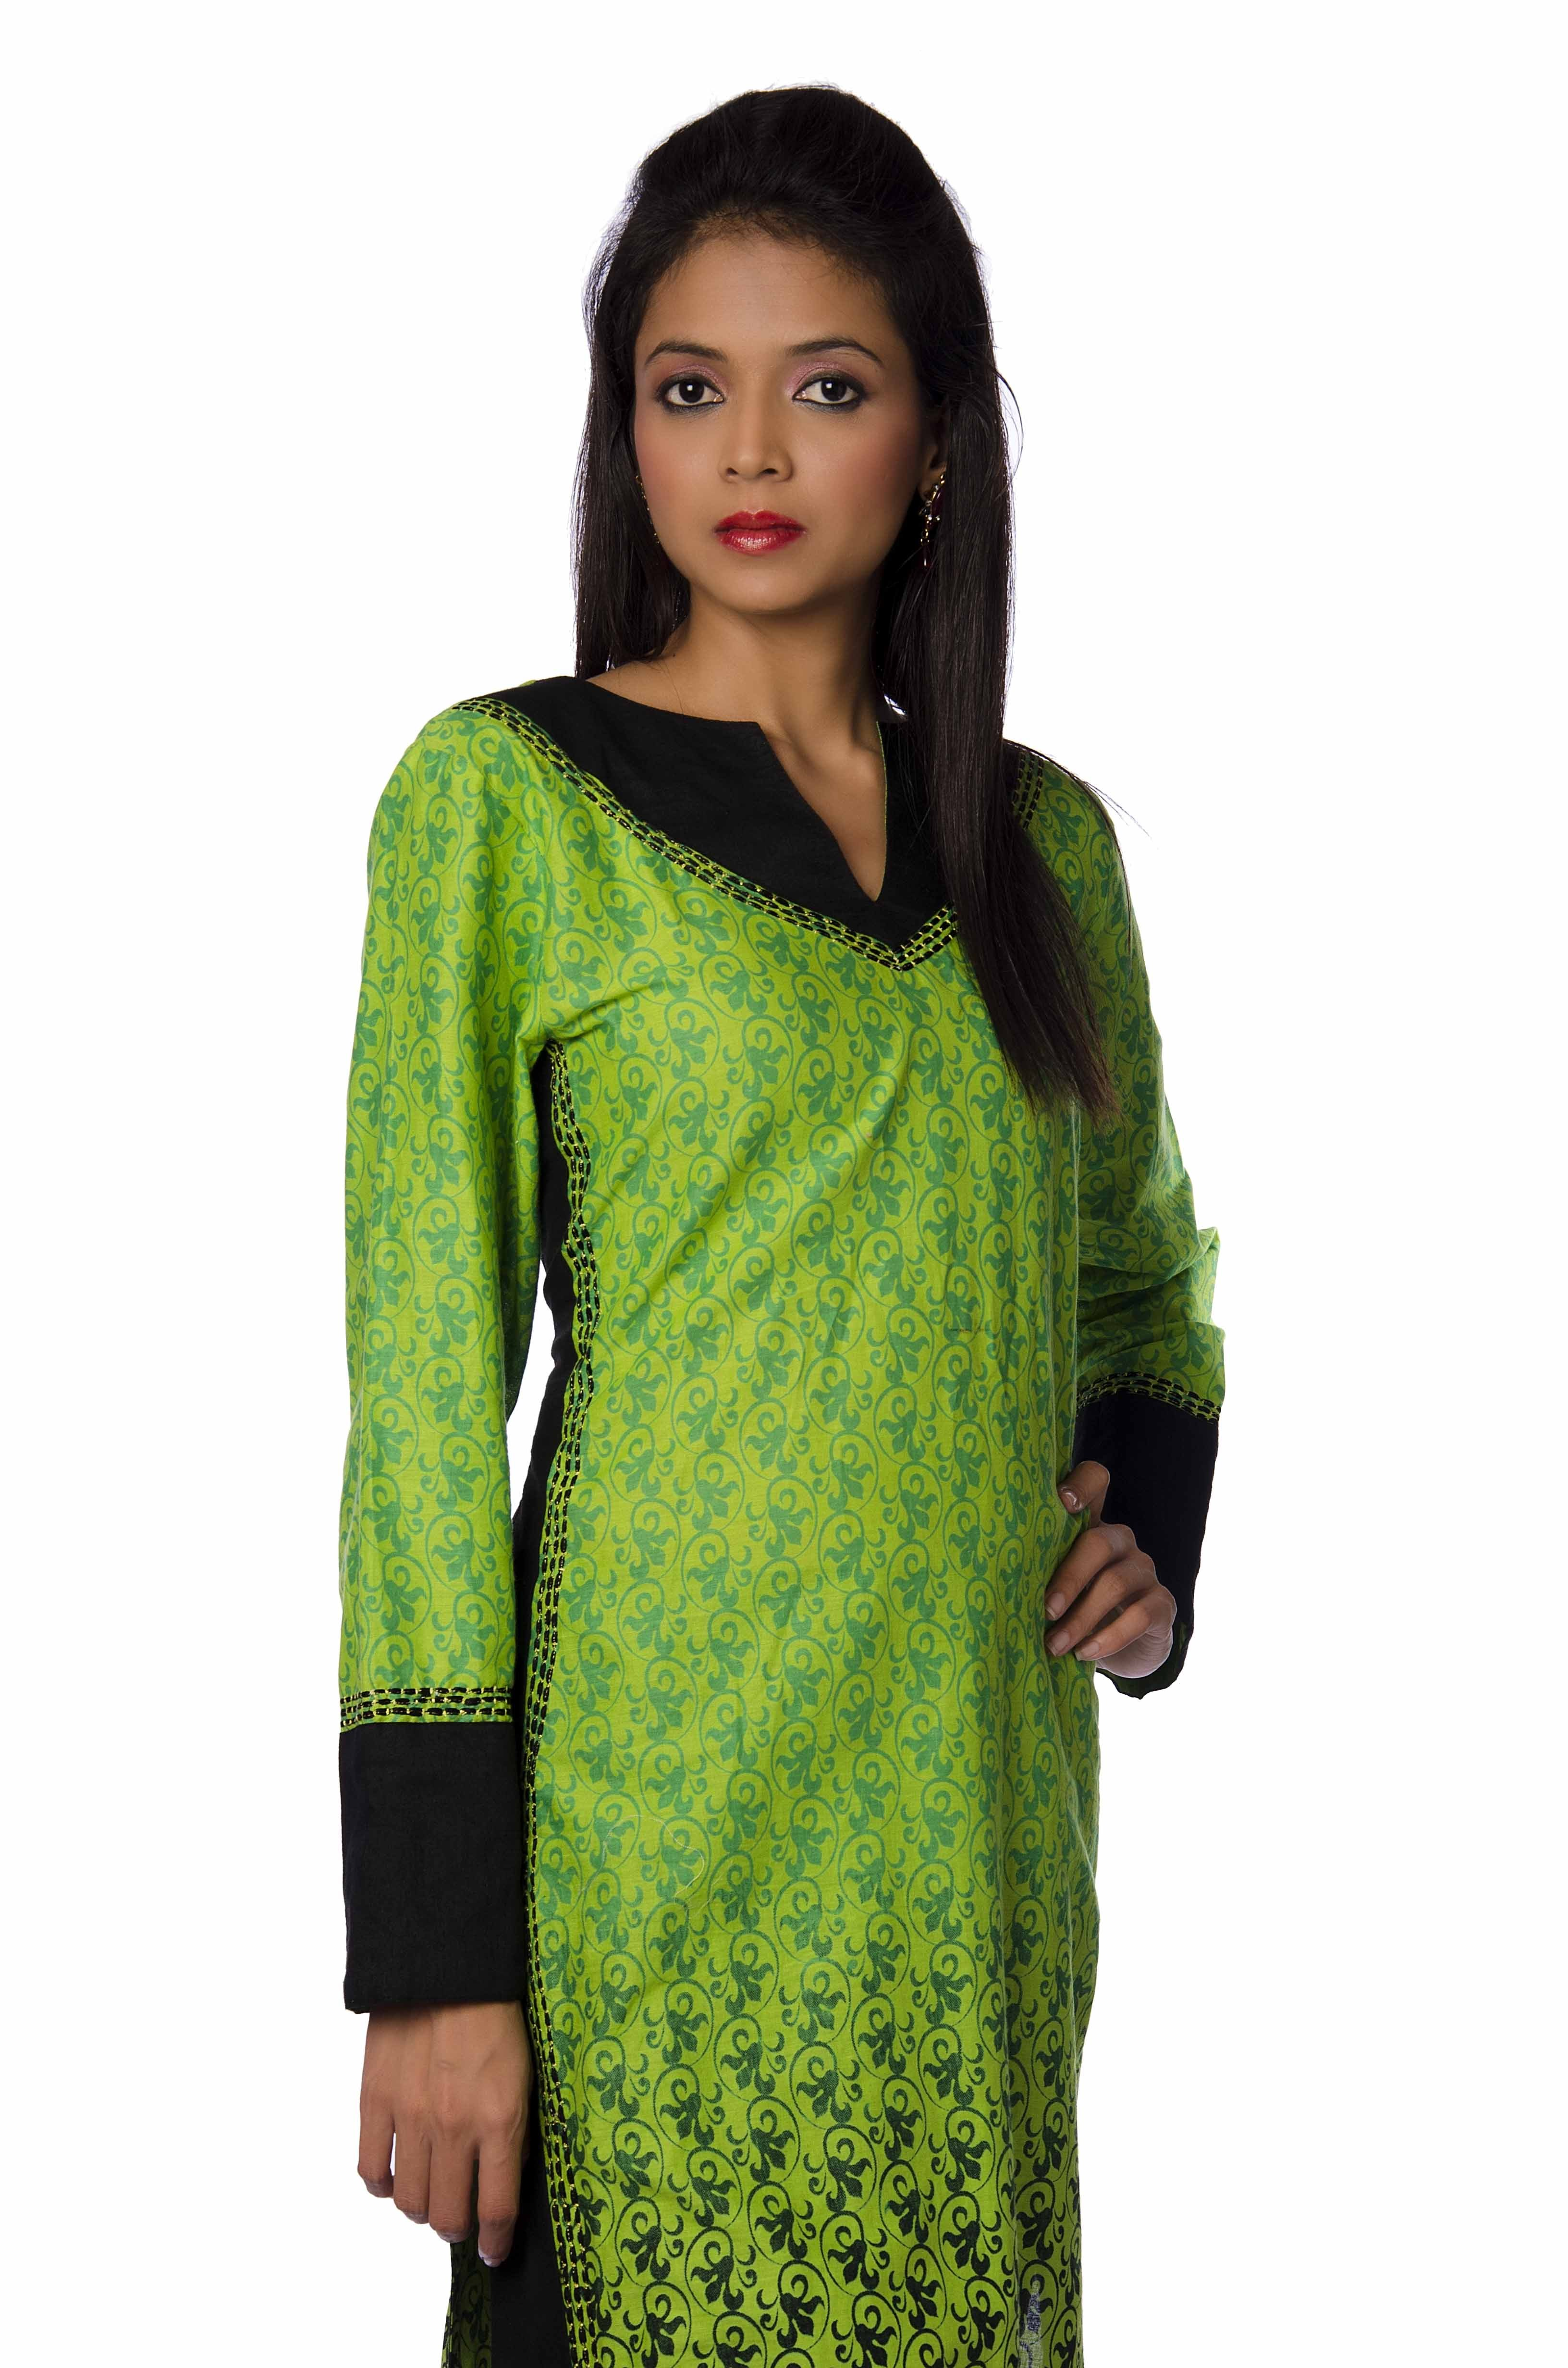 Long Top With Black Blockings In Lime Green Kurti Muhenera Presents Designer Urrmee Kapoor Made